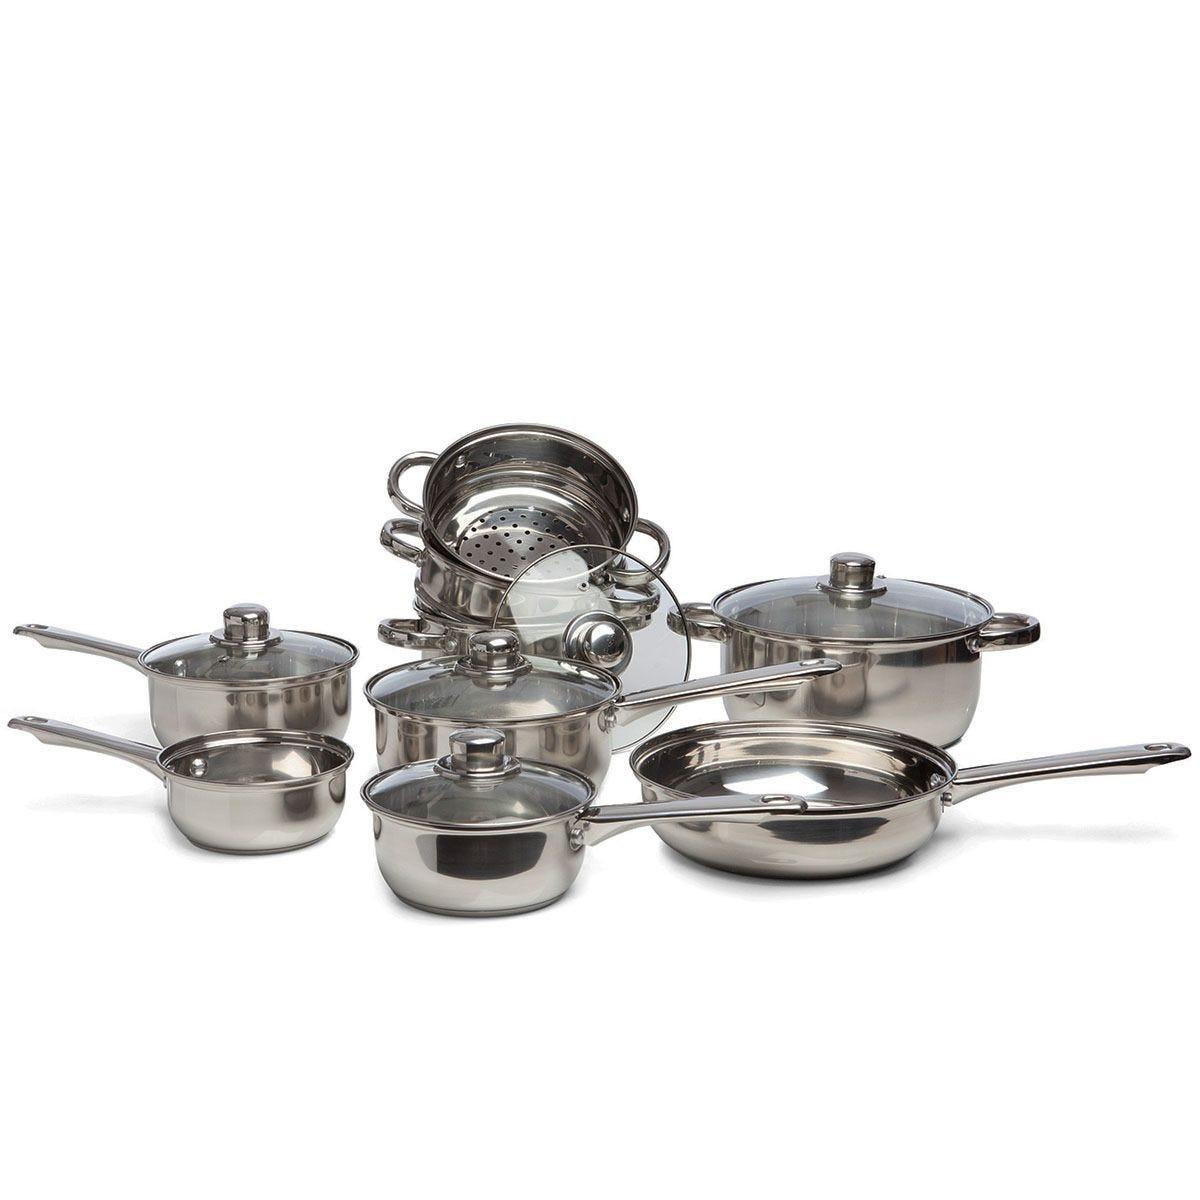 Sabichi Essential 9-Piece Cookware Set